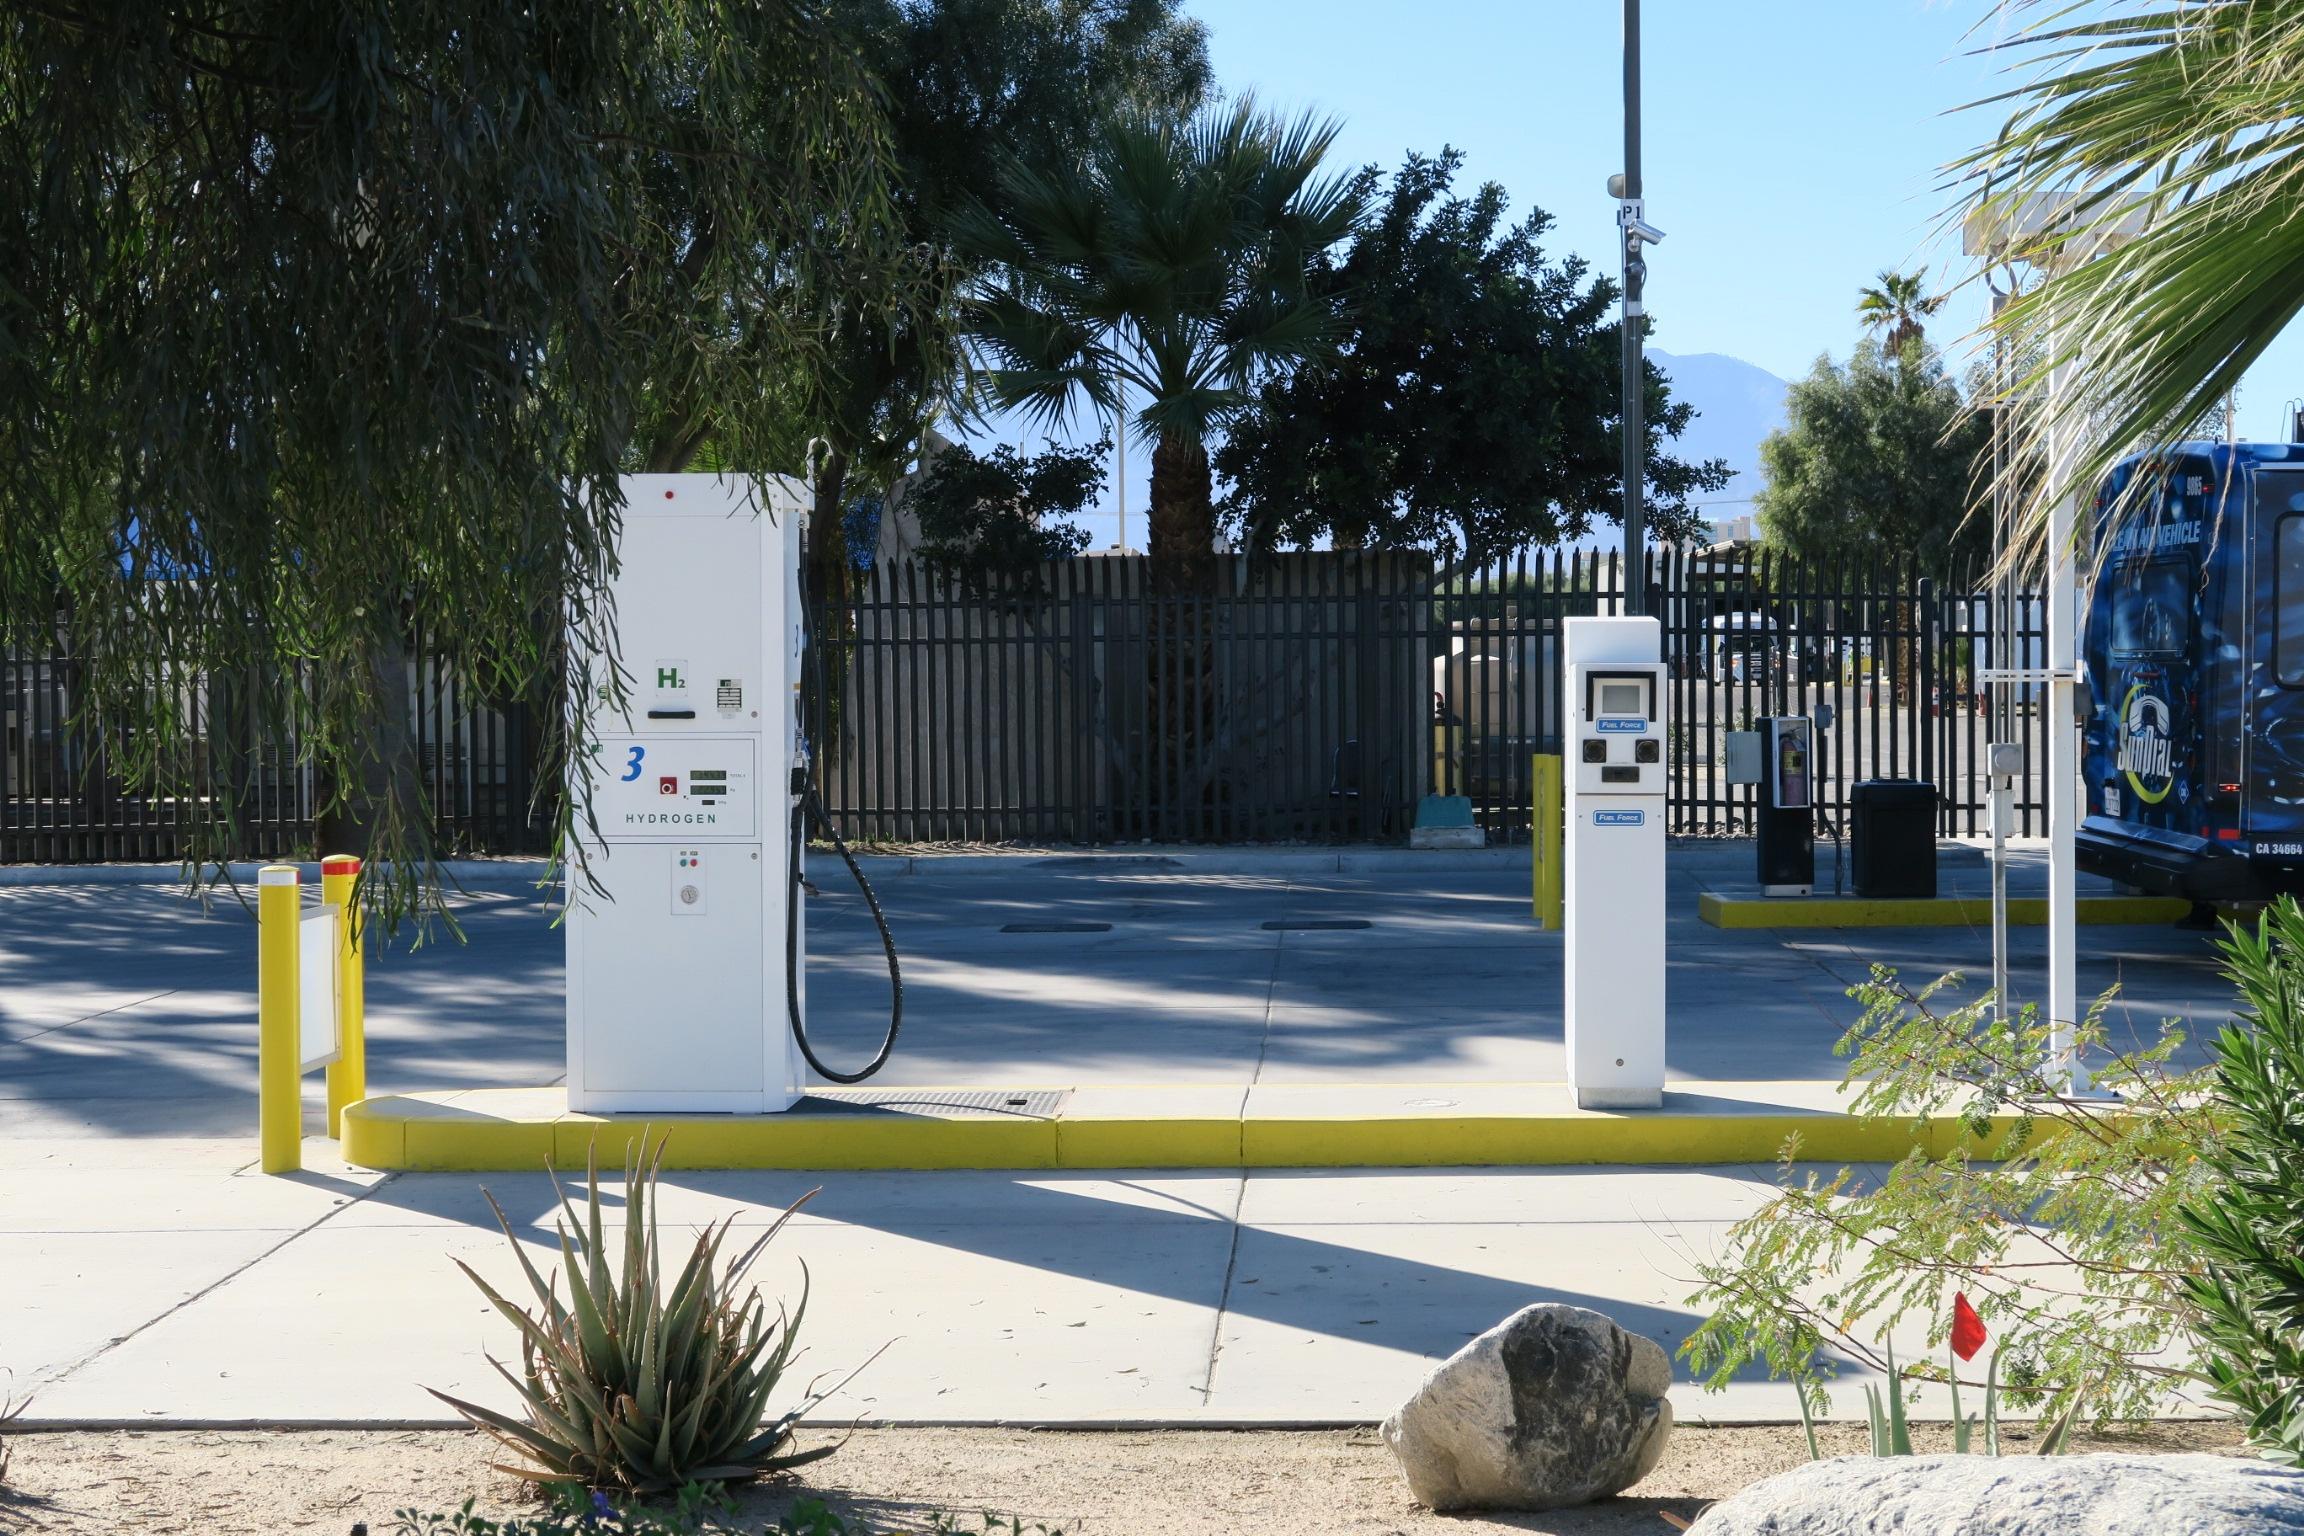 hydrogen-fueling-station-sunline-facilities-california.jpg